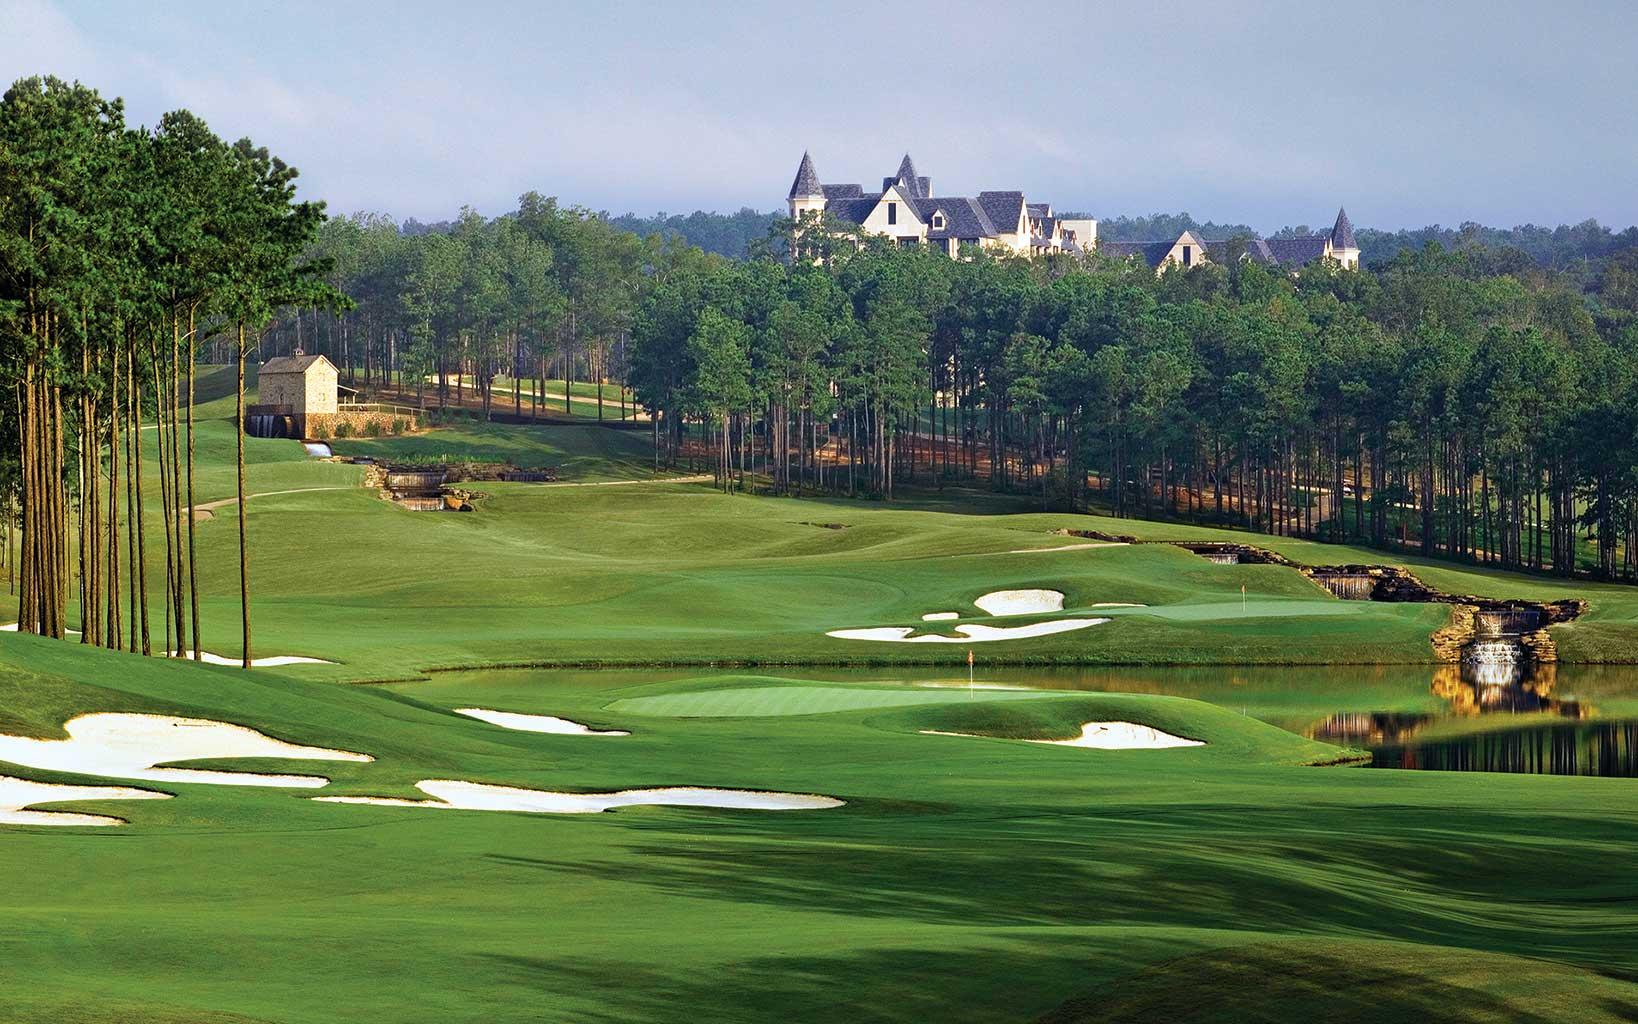 Golf and Spa Resort of the Week: Renaissance Birmingham Ross Bridge Golf Resort & Spa